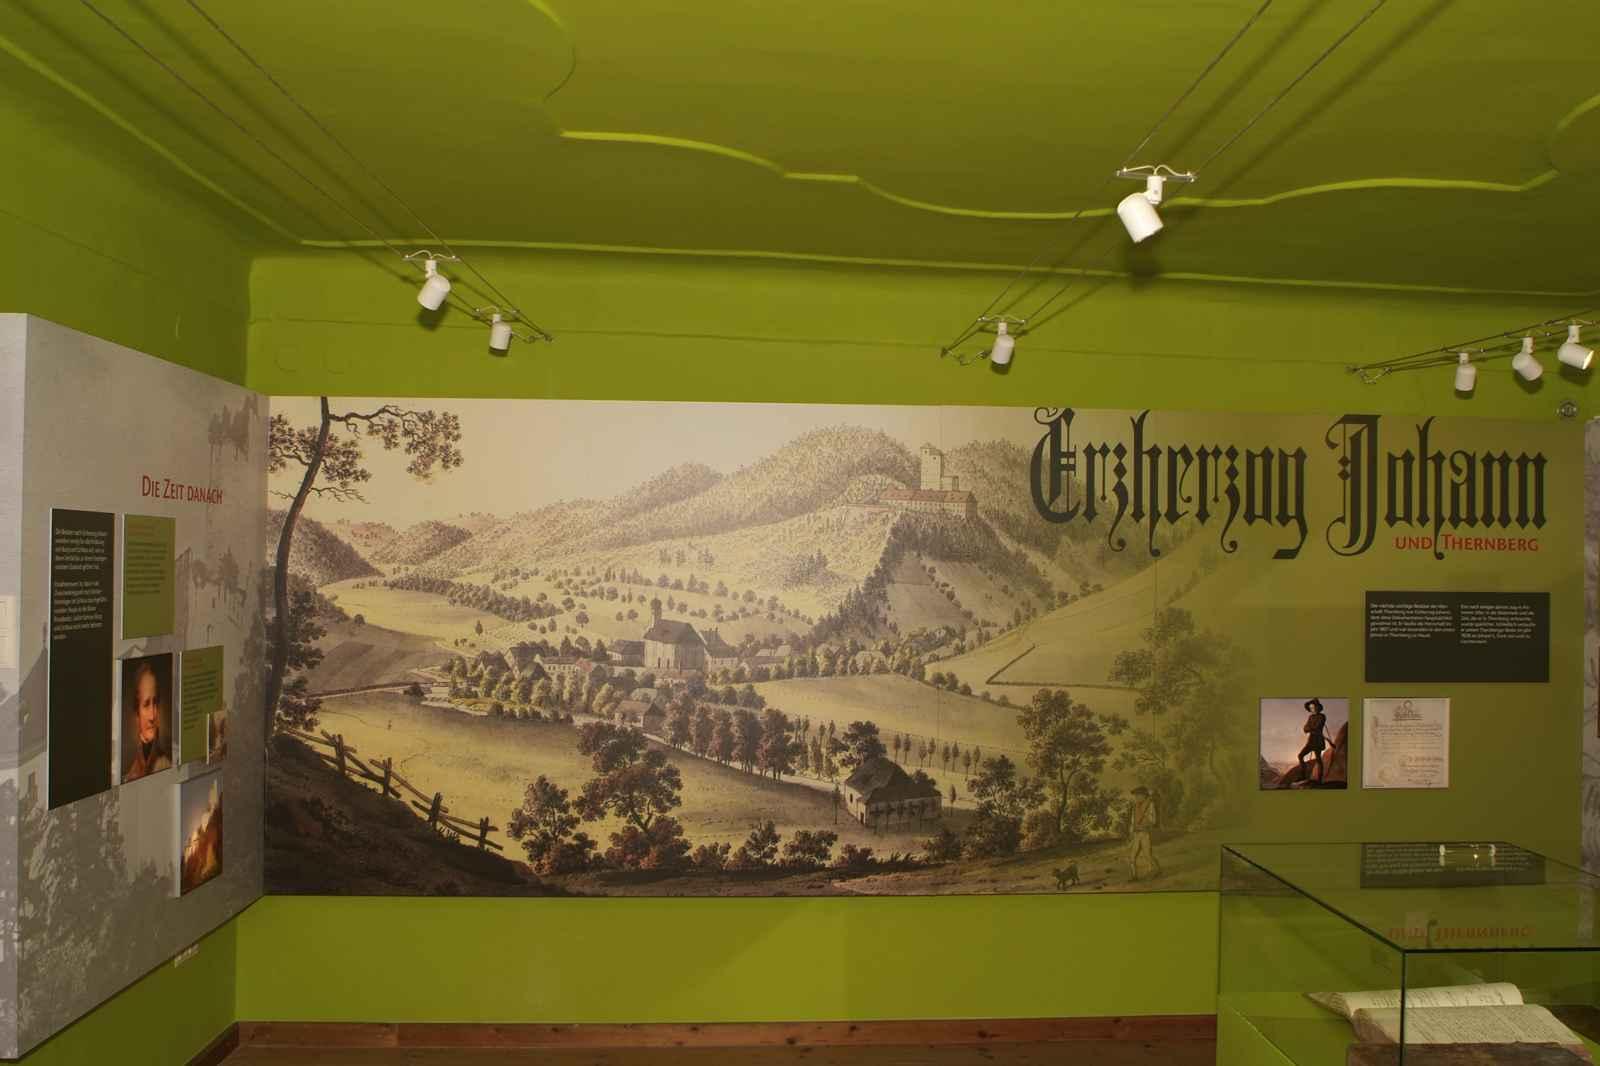 Messnerhaus Biografie Erzherzog Johanns